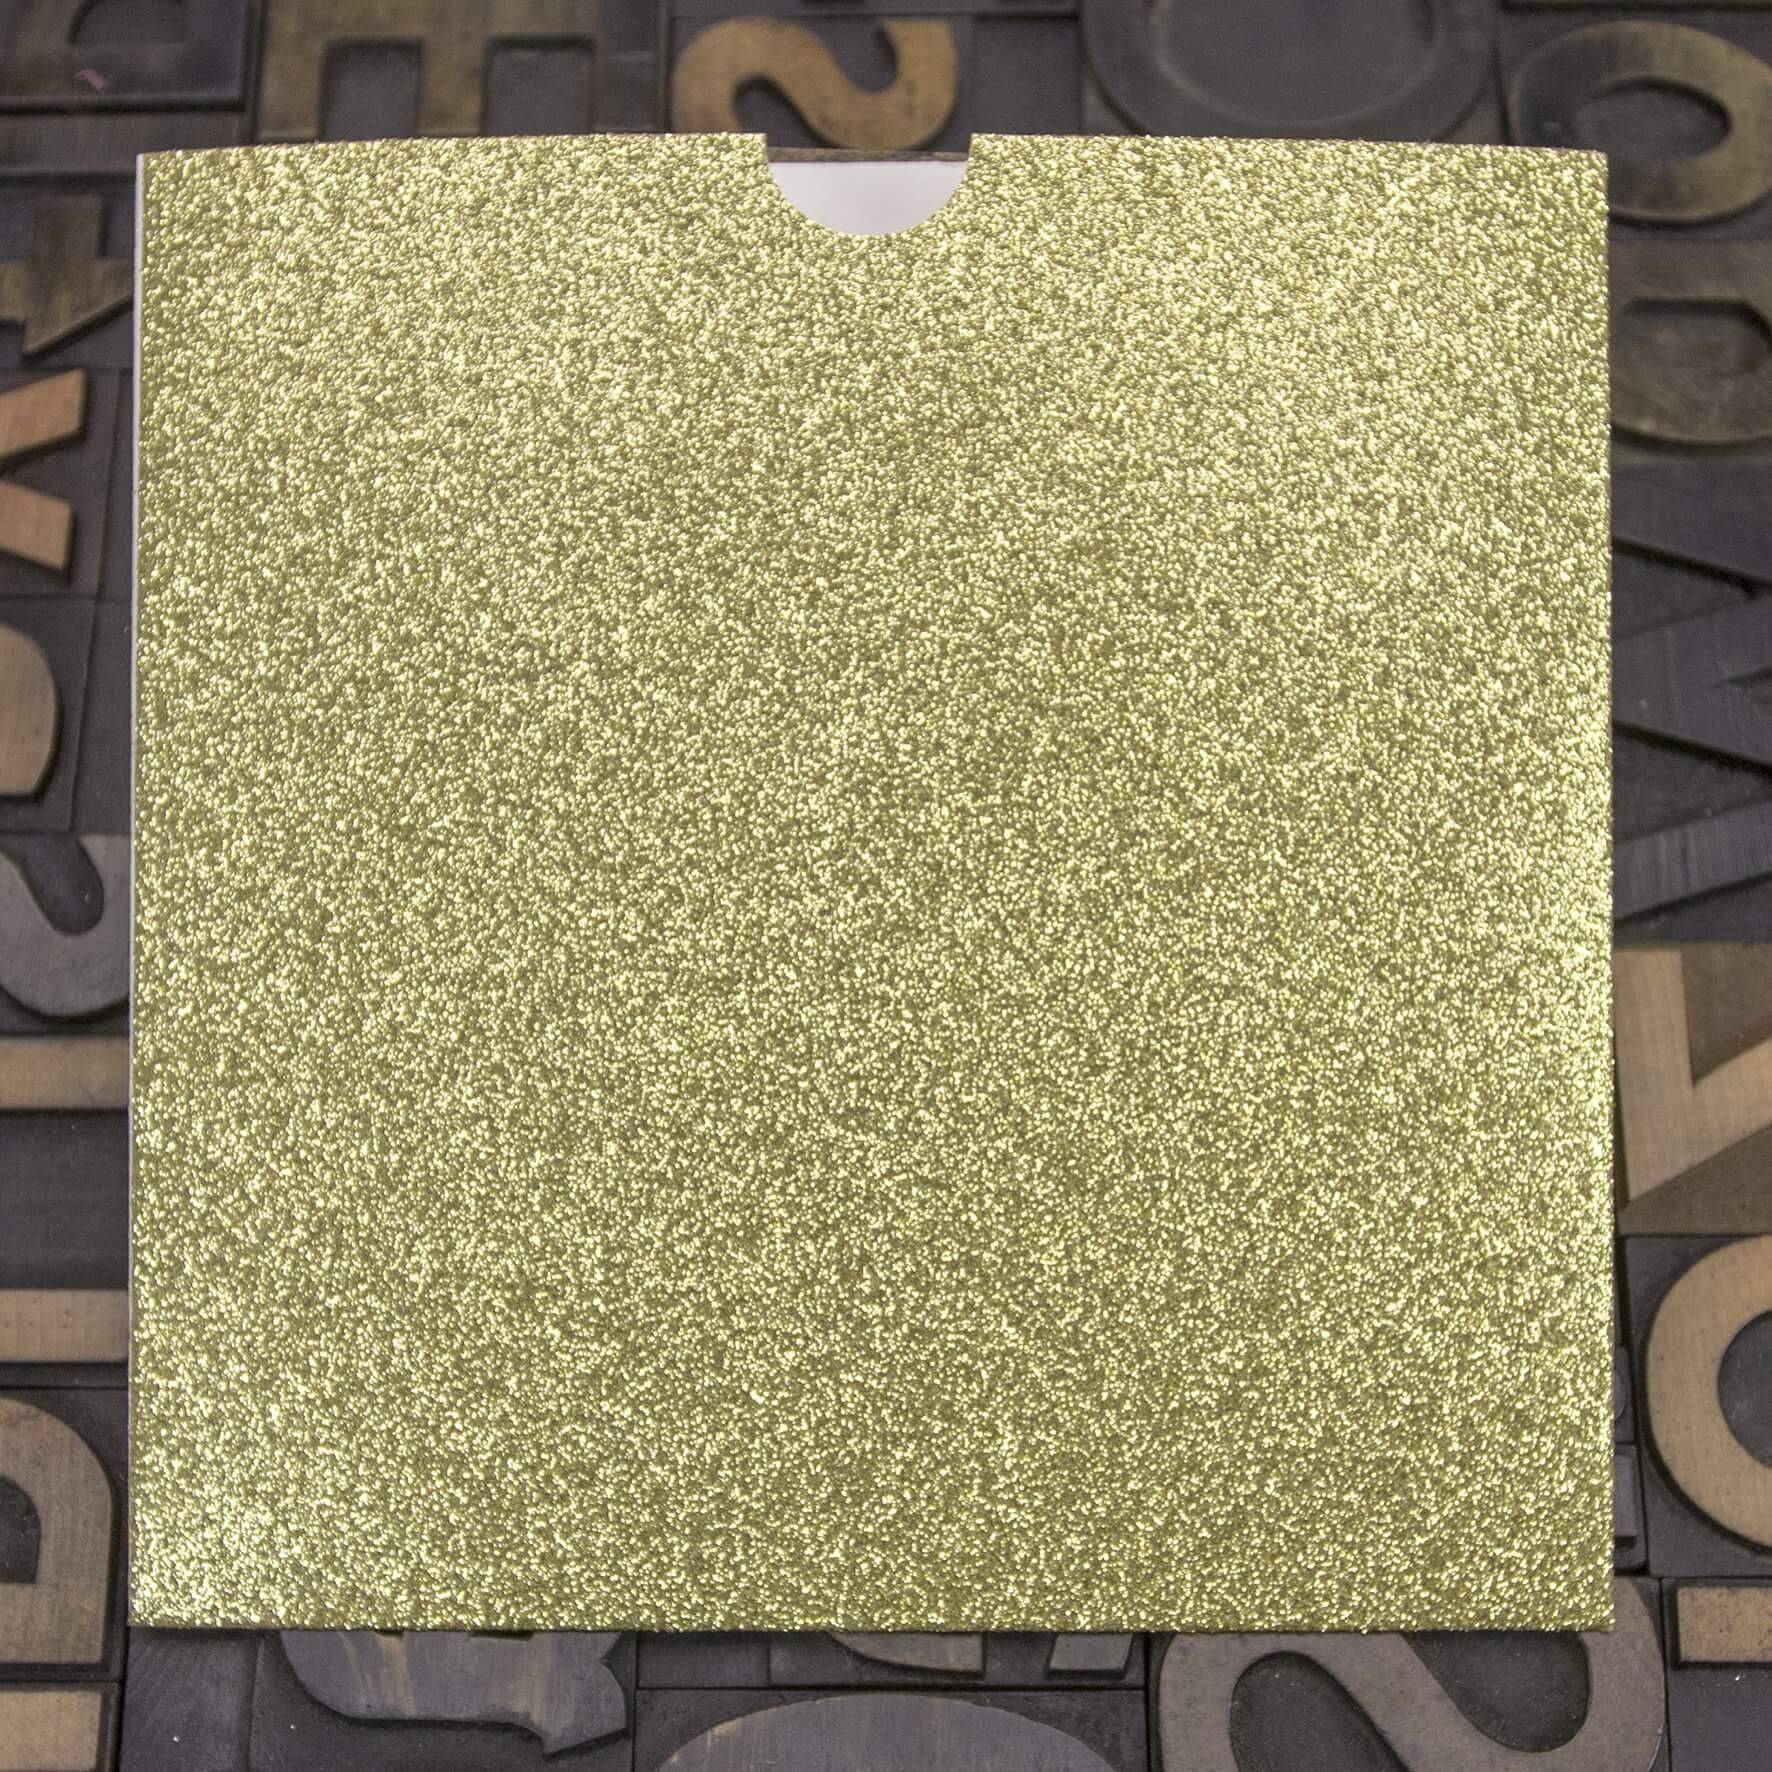 Enfolio Wallet 146mm Sq - Gold Glitter Card